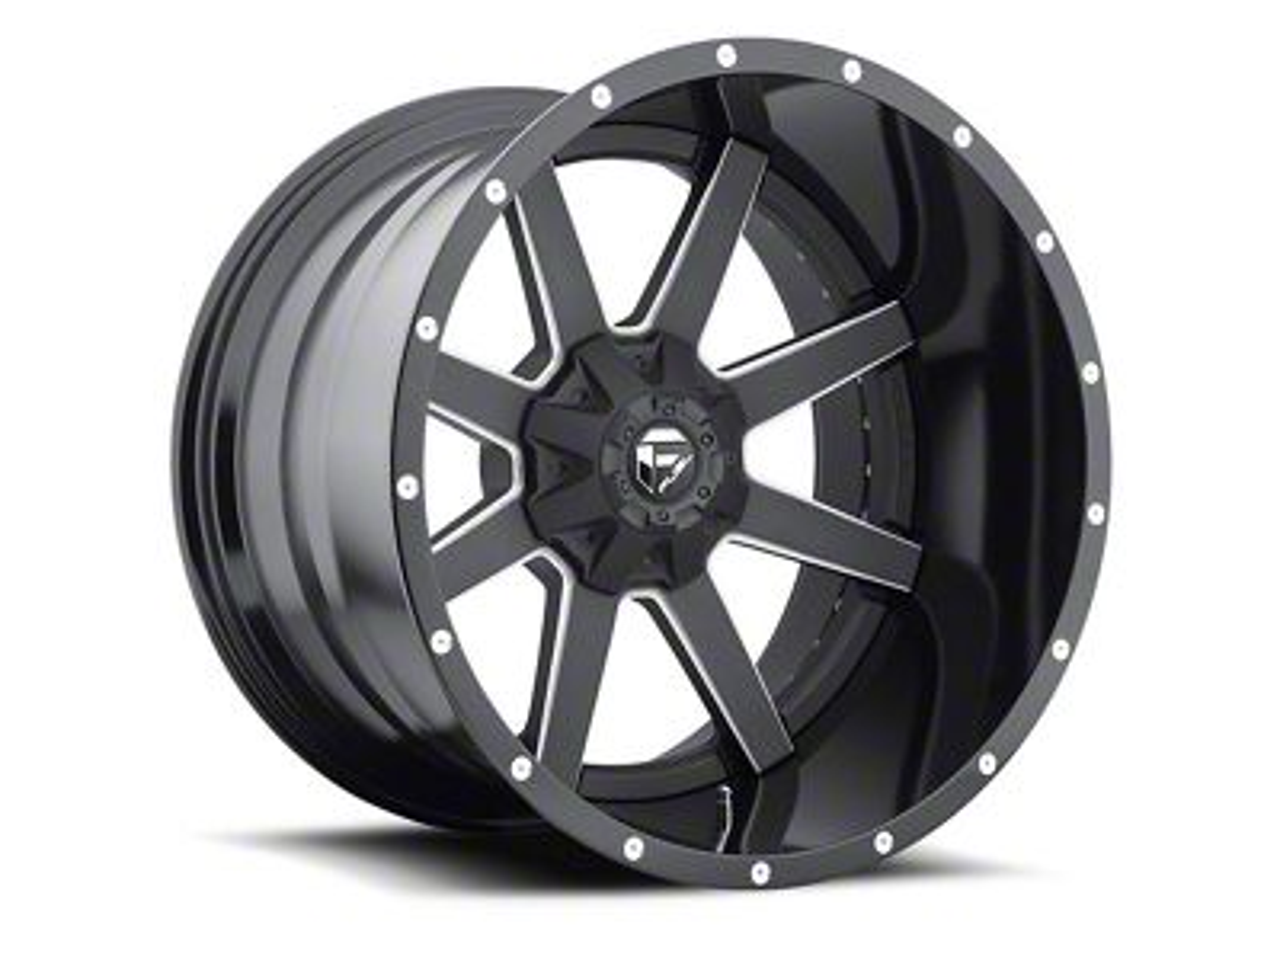 Fuel Wheels Maverick 2-Piece Black Milled 6-Lug Wheel - 20x12 (04-19 F-150)